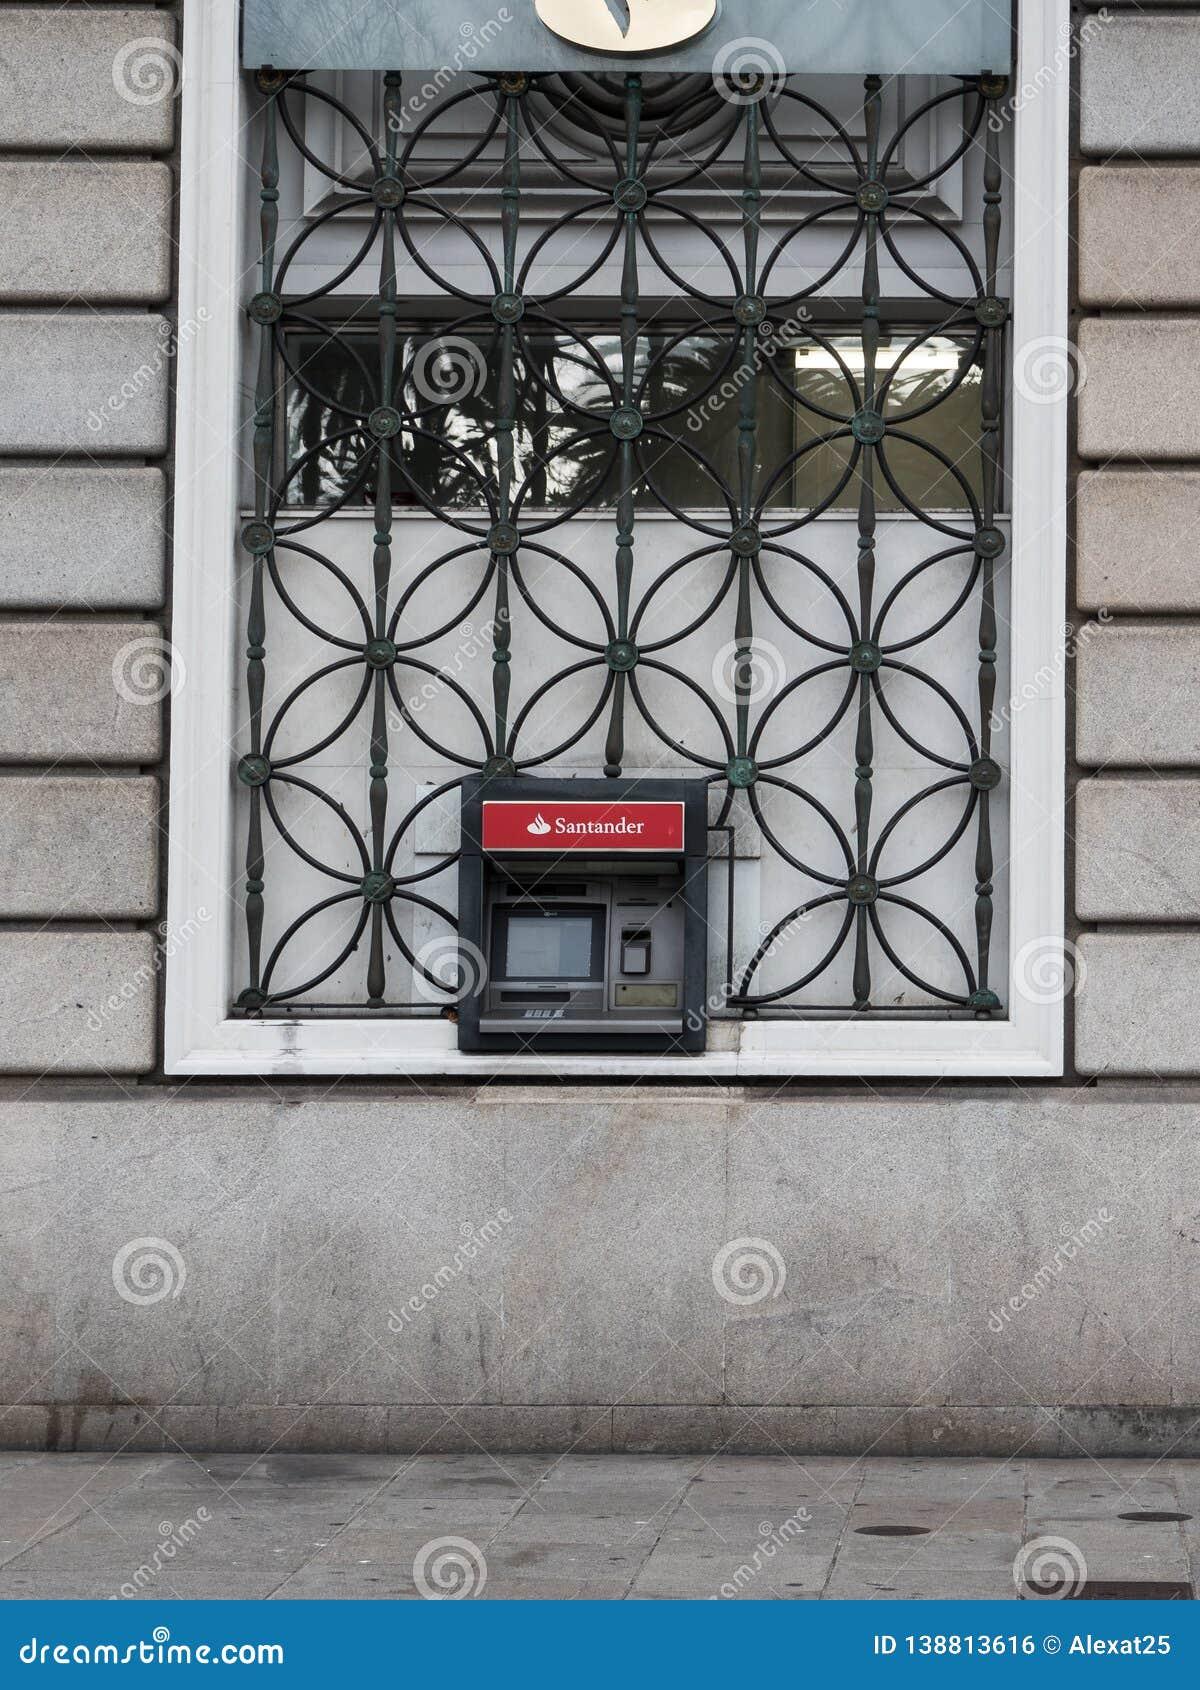 A Coruna, Spain - ATM Of Santander Bank In The Street